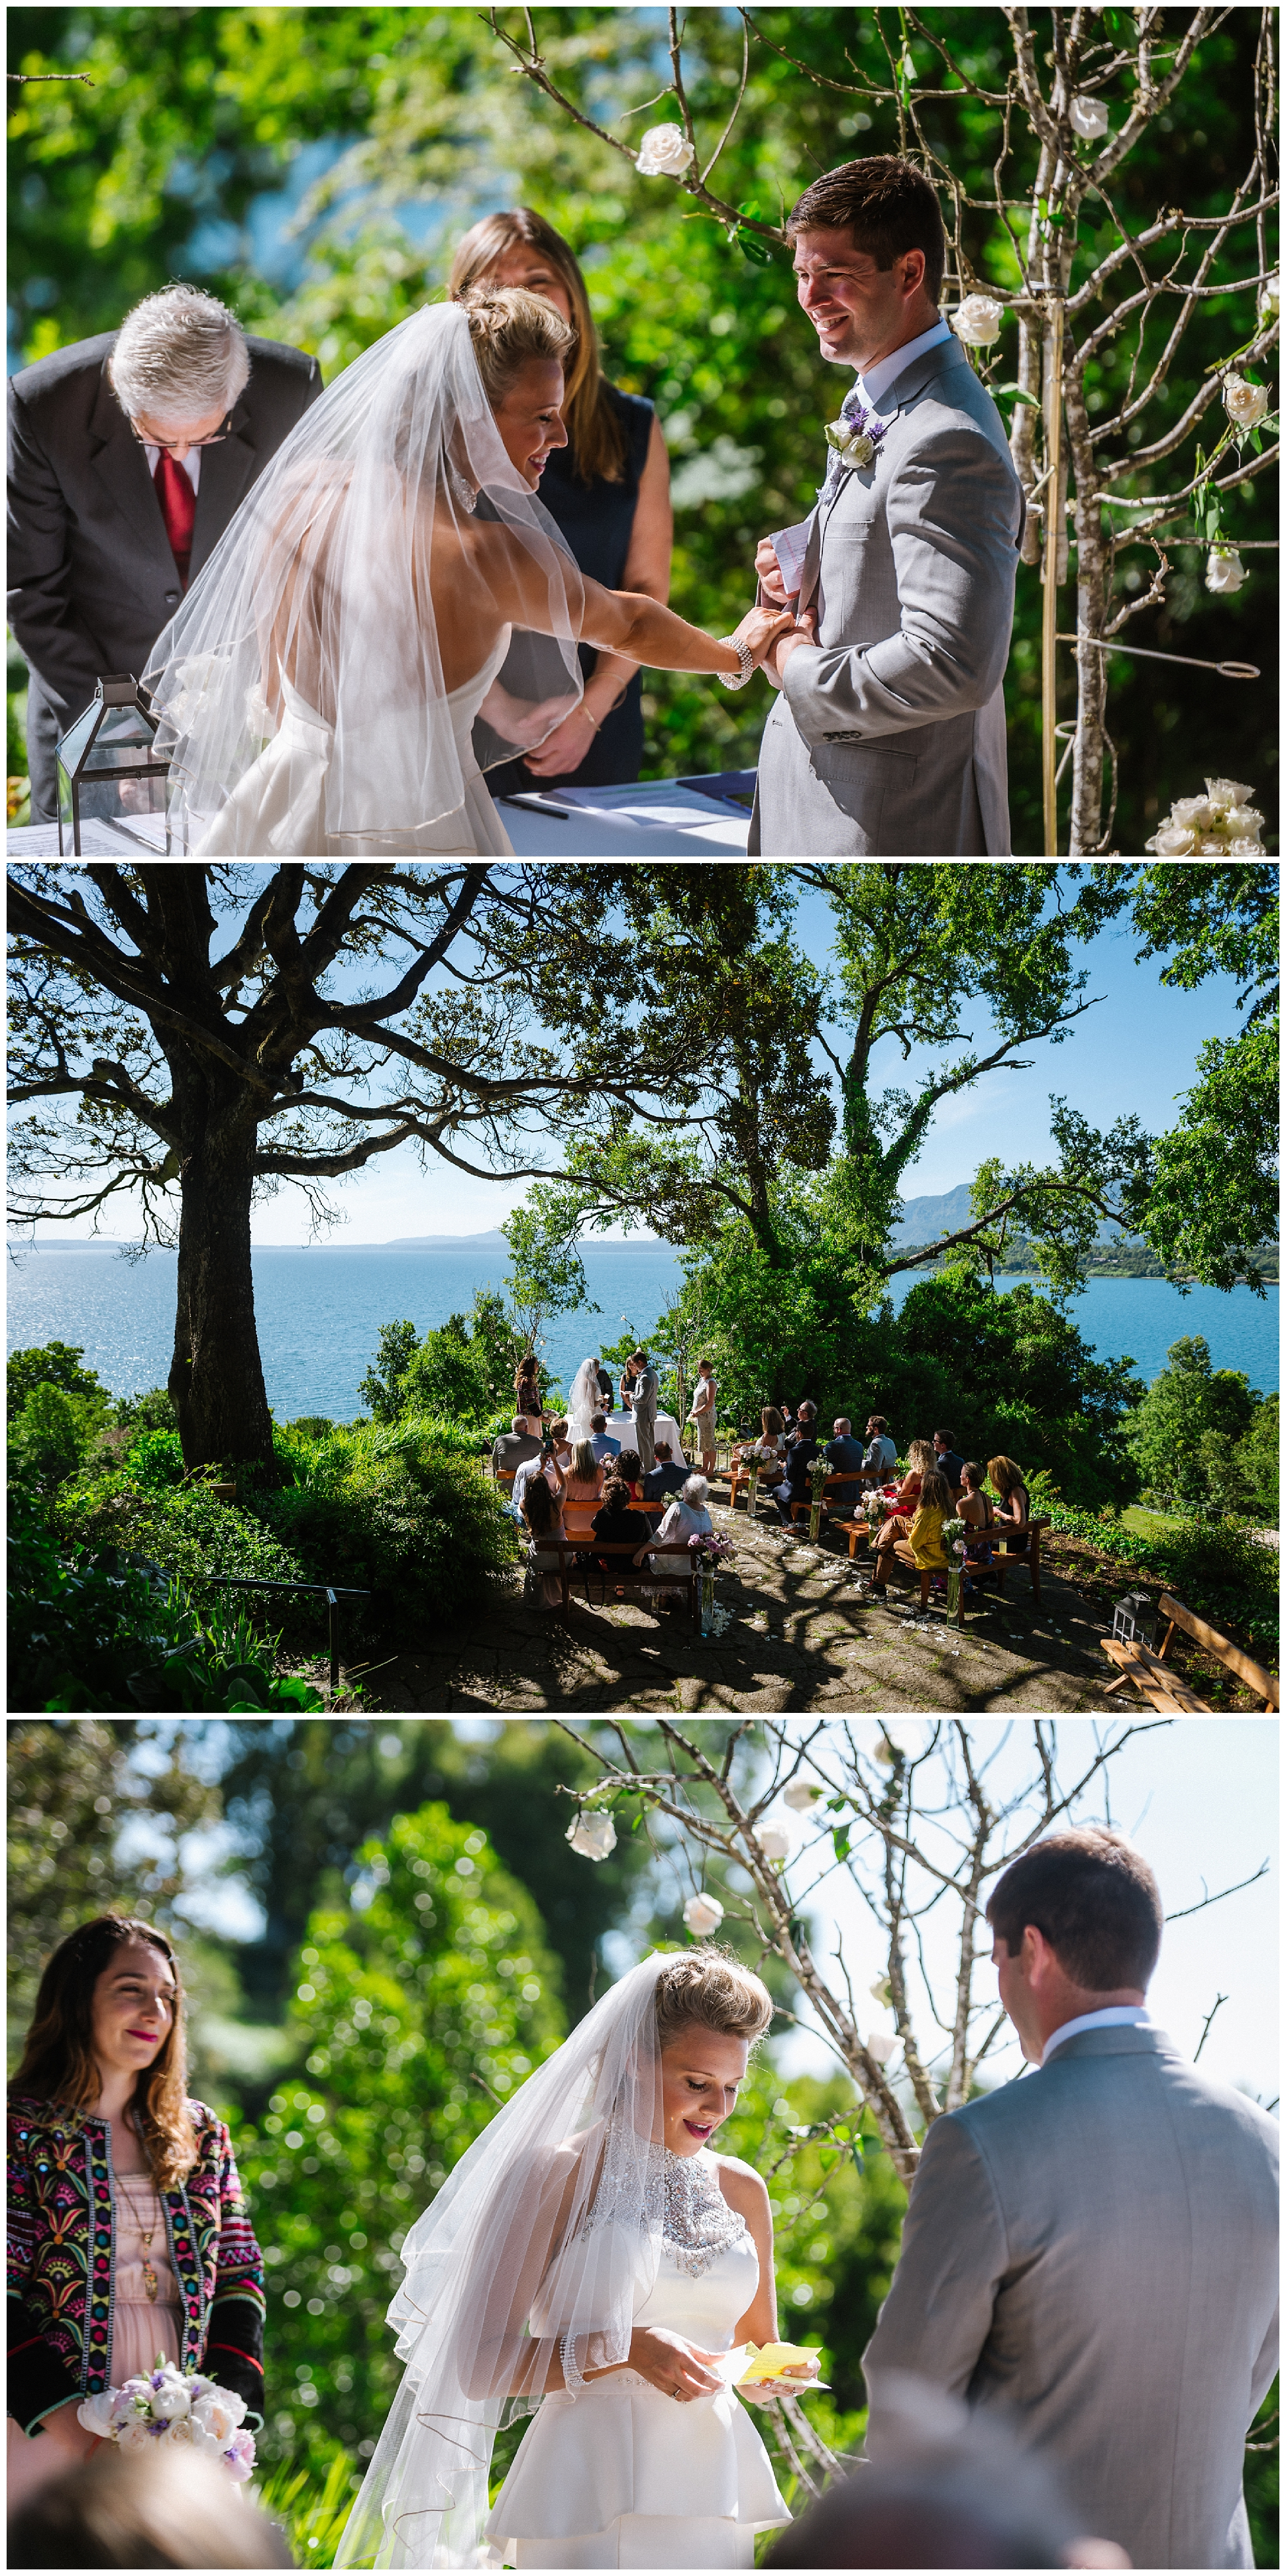 Cheilean-destination-adventure-wedding-florida-patagonia-pucon-santa-cruz-vsco_0095.jpg